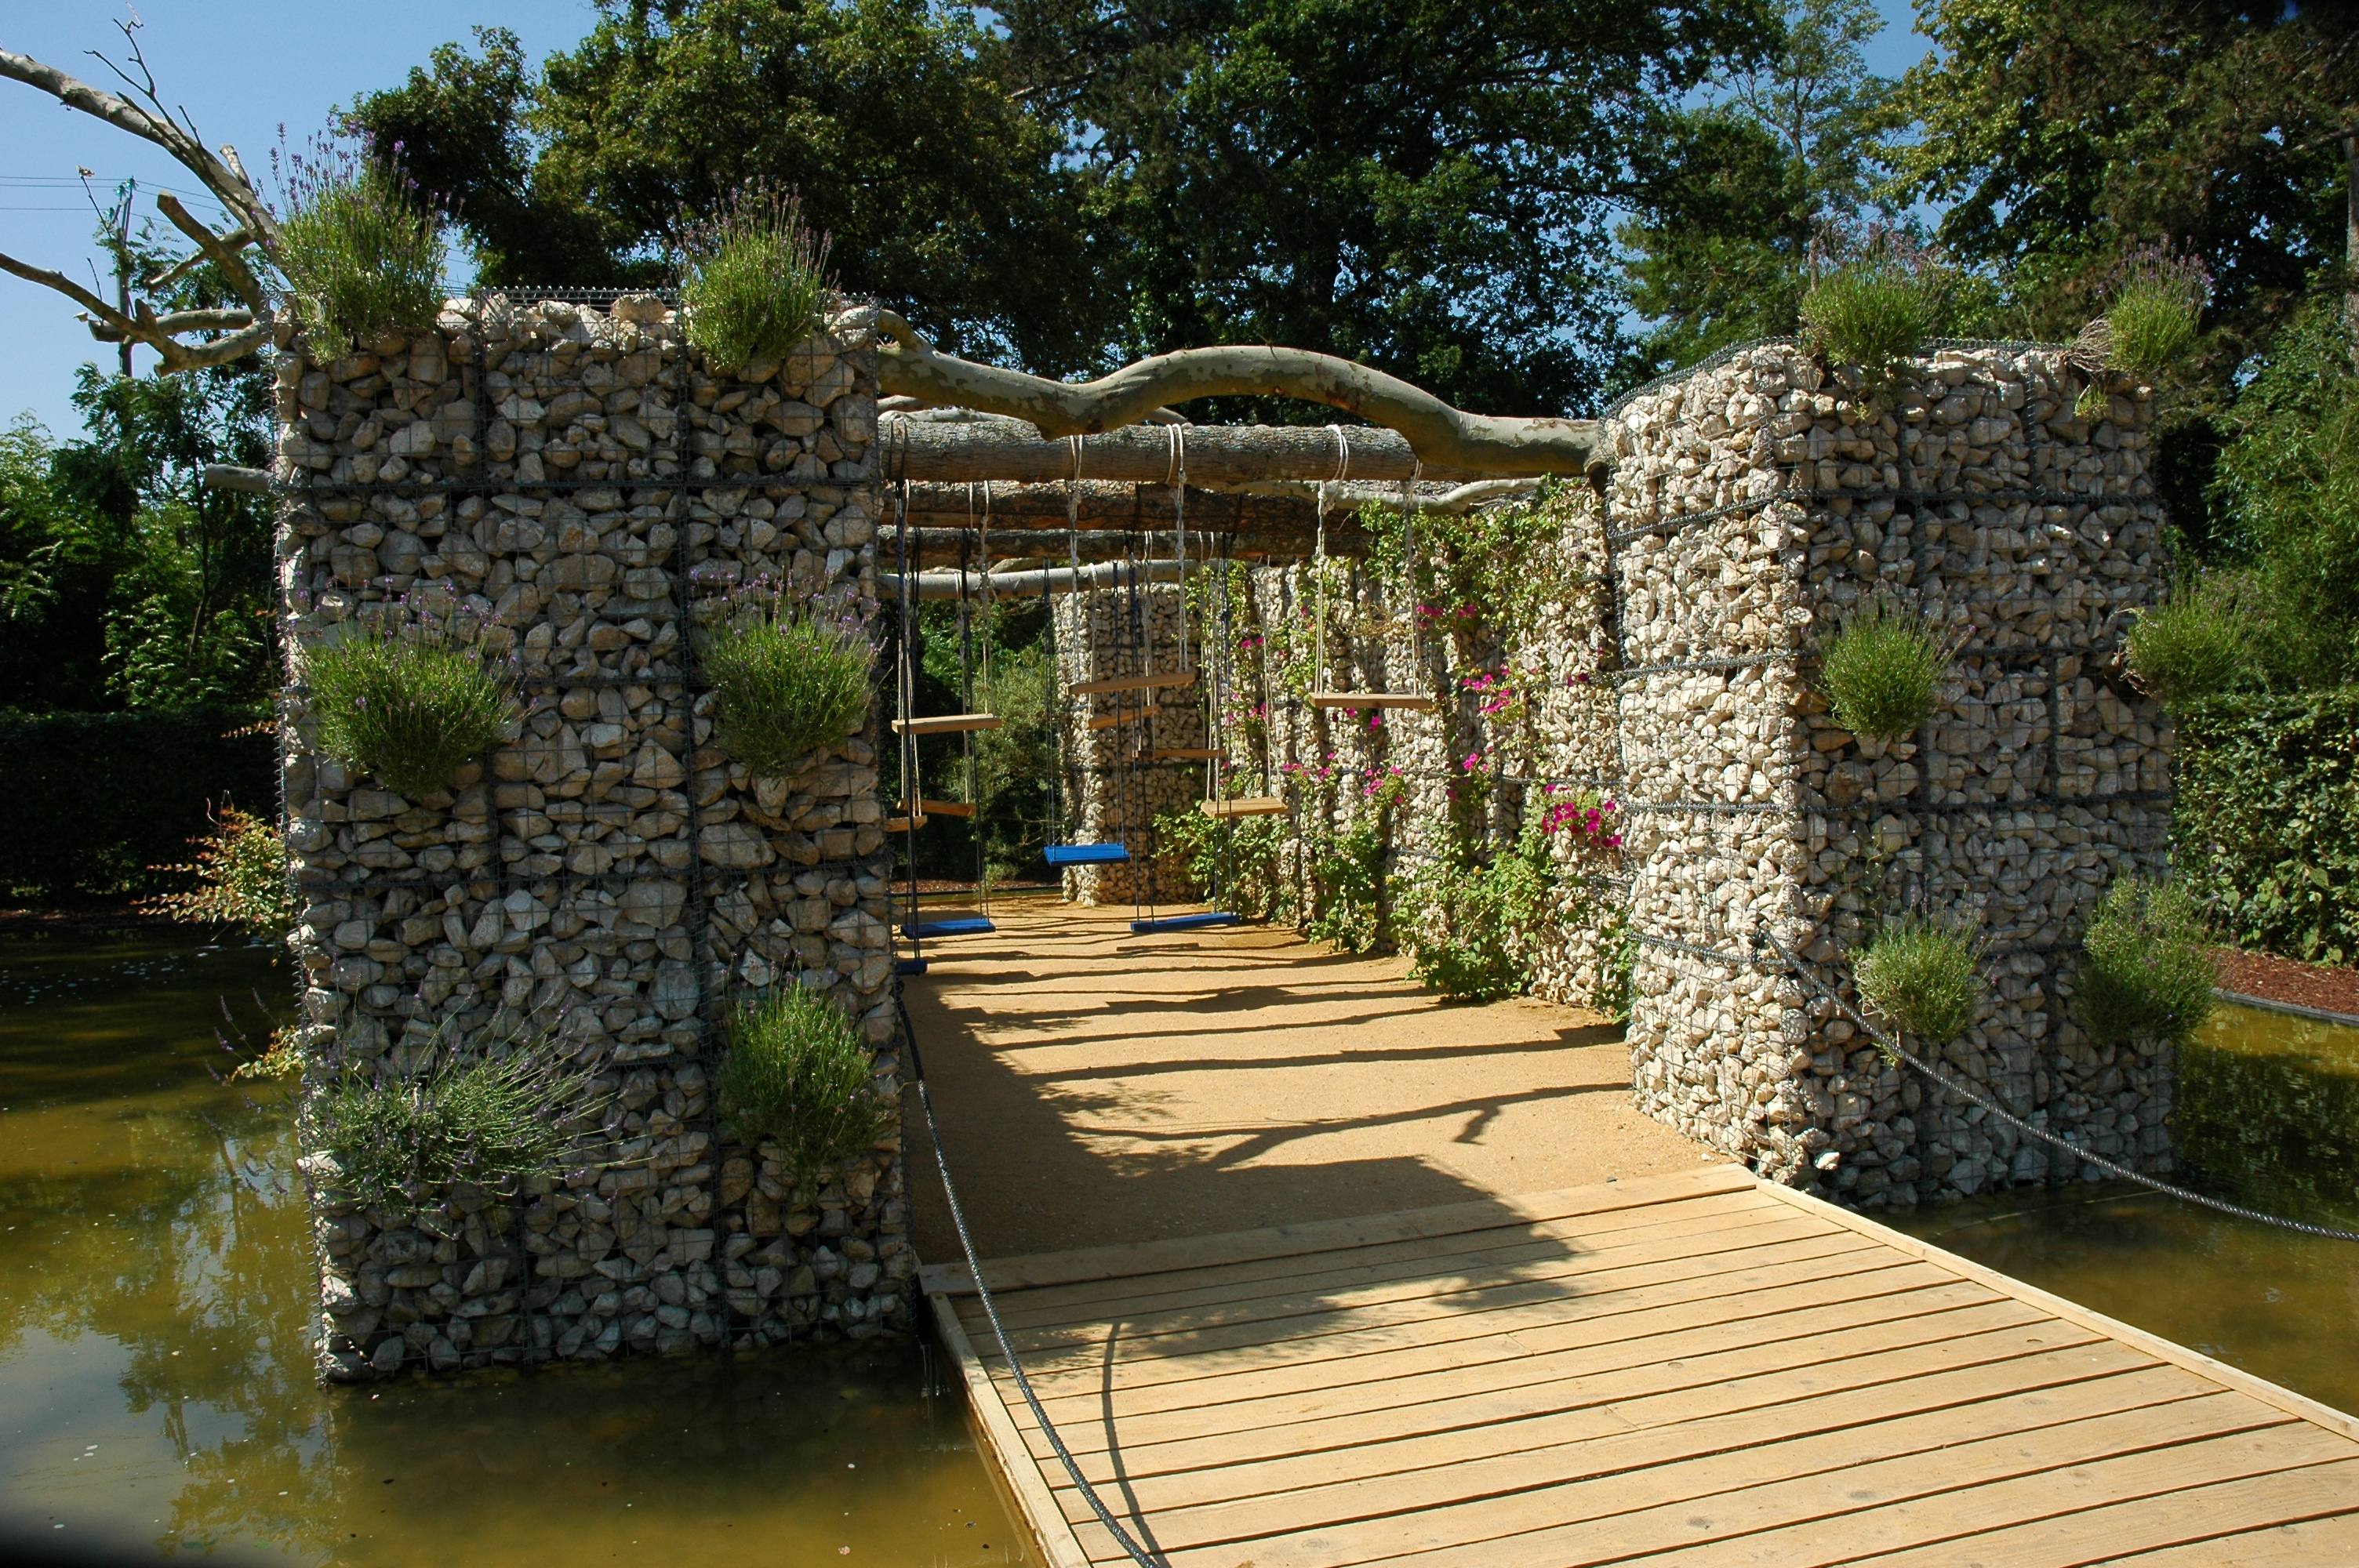 File france loir et cher festival jardins chaumont sur loire 2006 06 swings 01 jpg wikimedia - Jardins chaumont sur loire ...